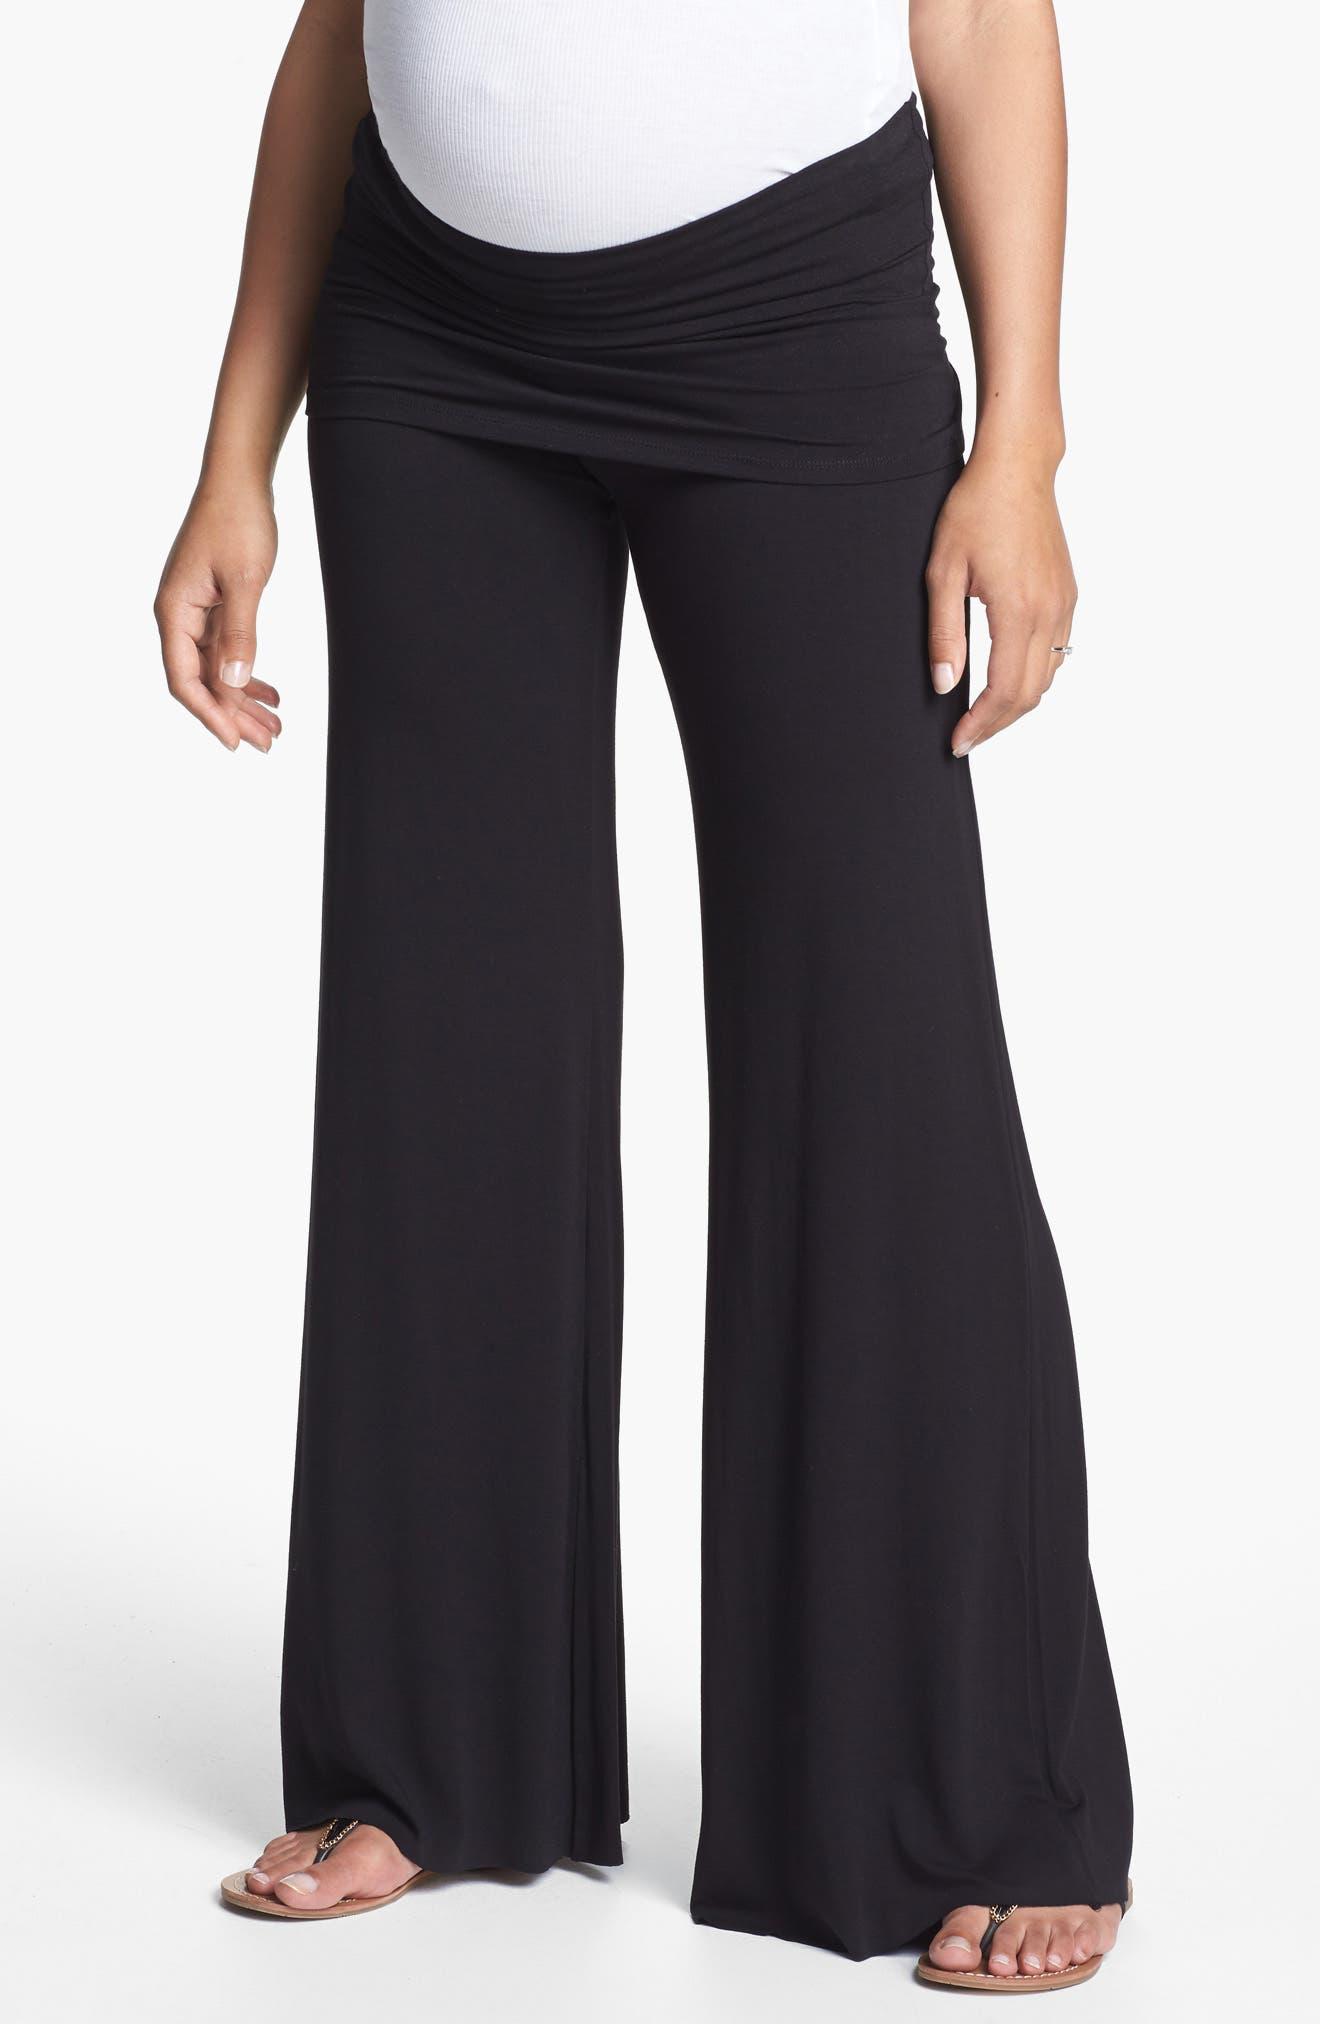 MATERNAL AMERICA, Knit Flare Leg Maternity Pants, Main thumbnail 1, color, BLACK